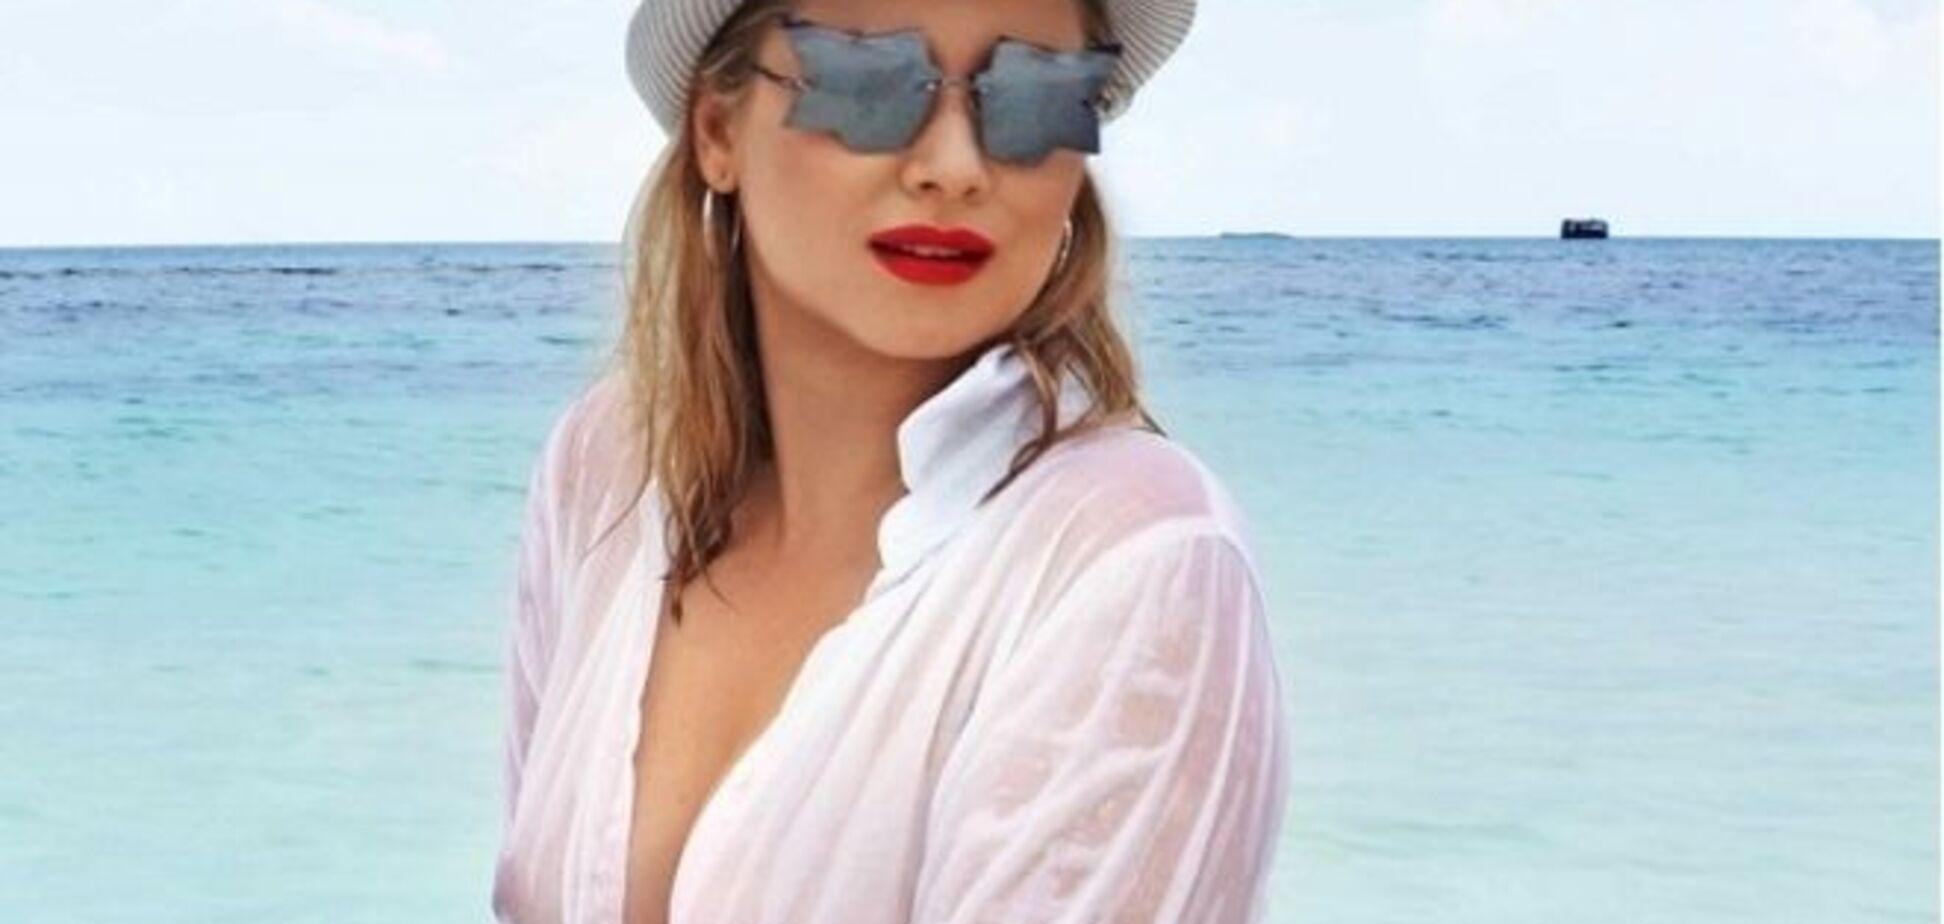 Эпатажная Лена Ленина снова забыла надеть на пляж купальник